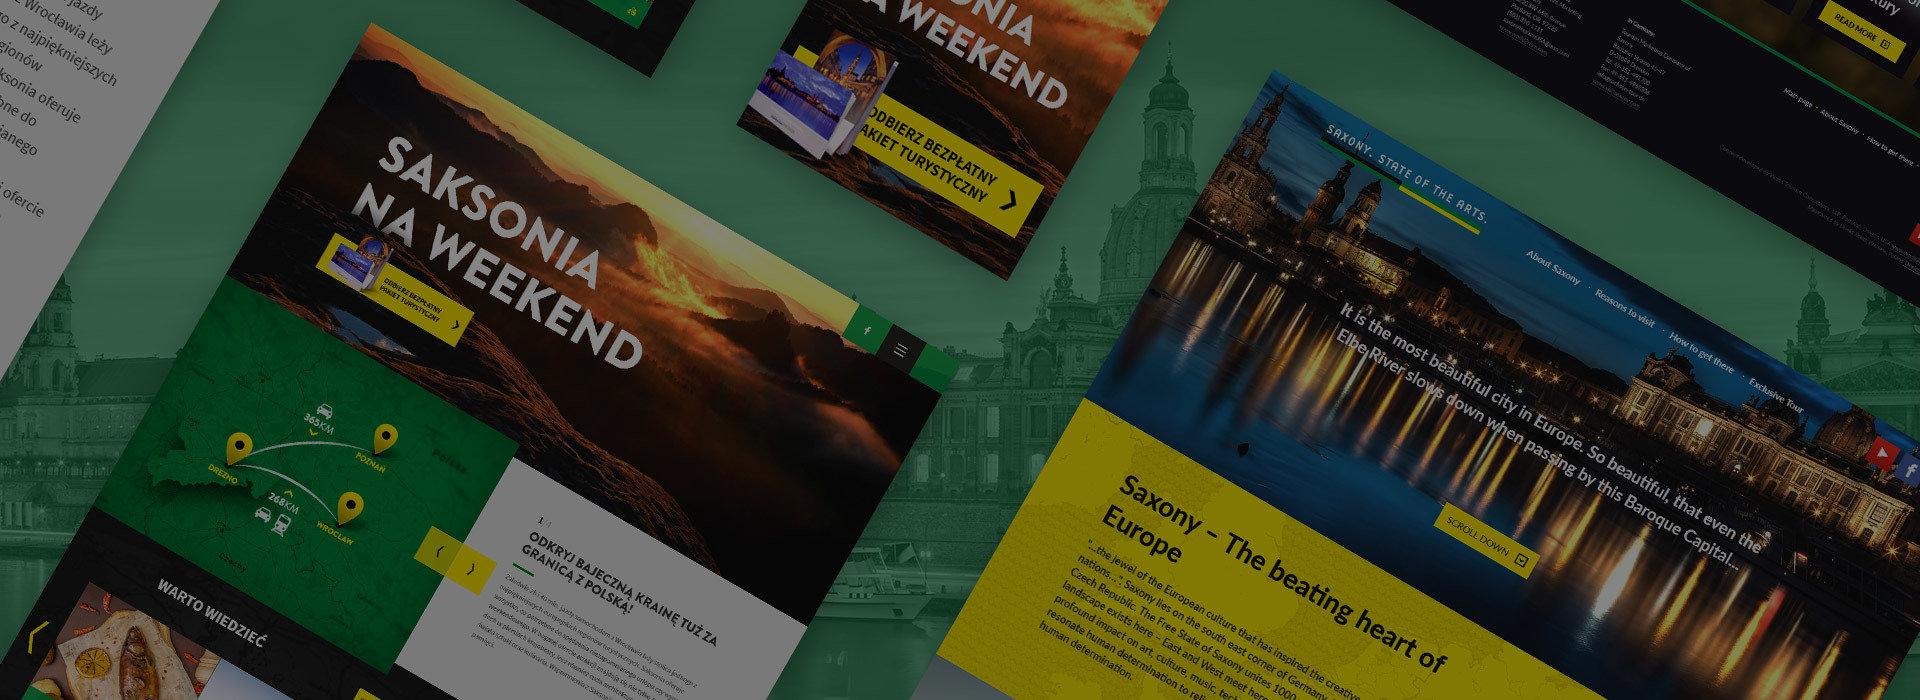 Destination marketing for Saxony land, Germany